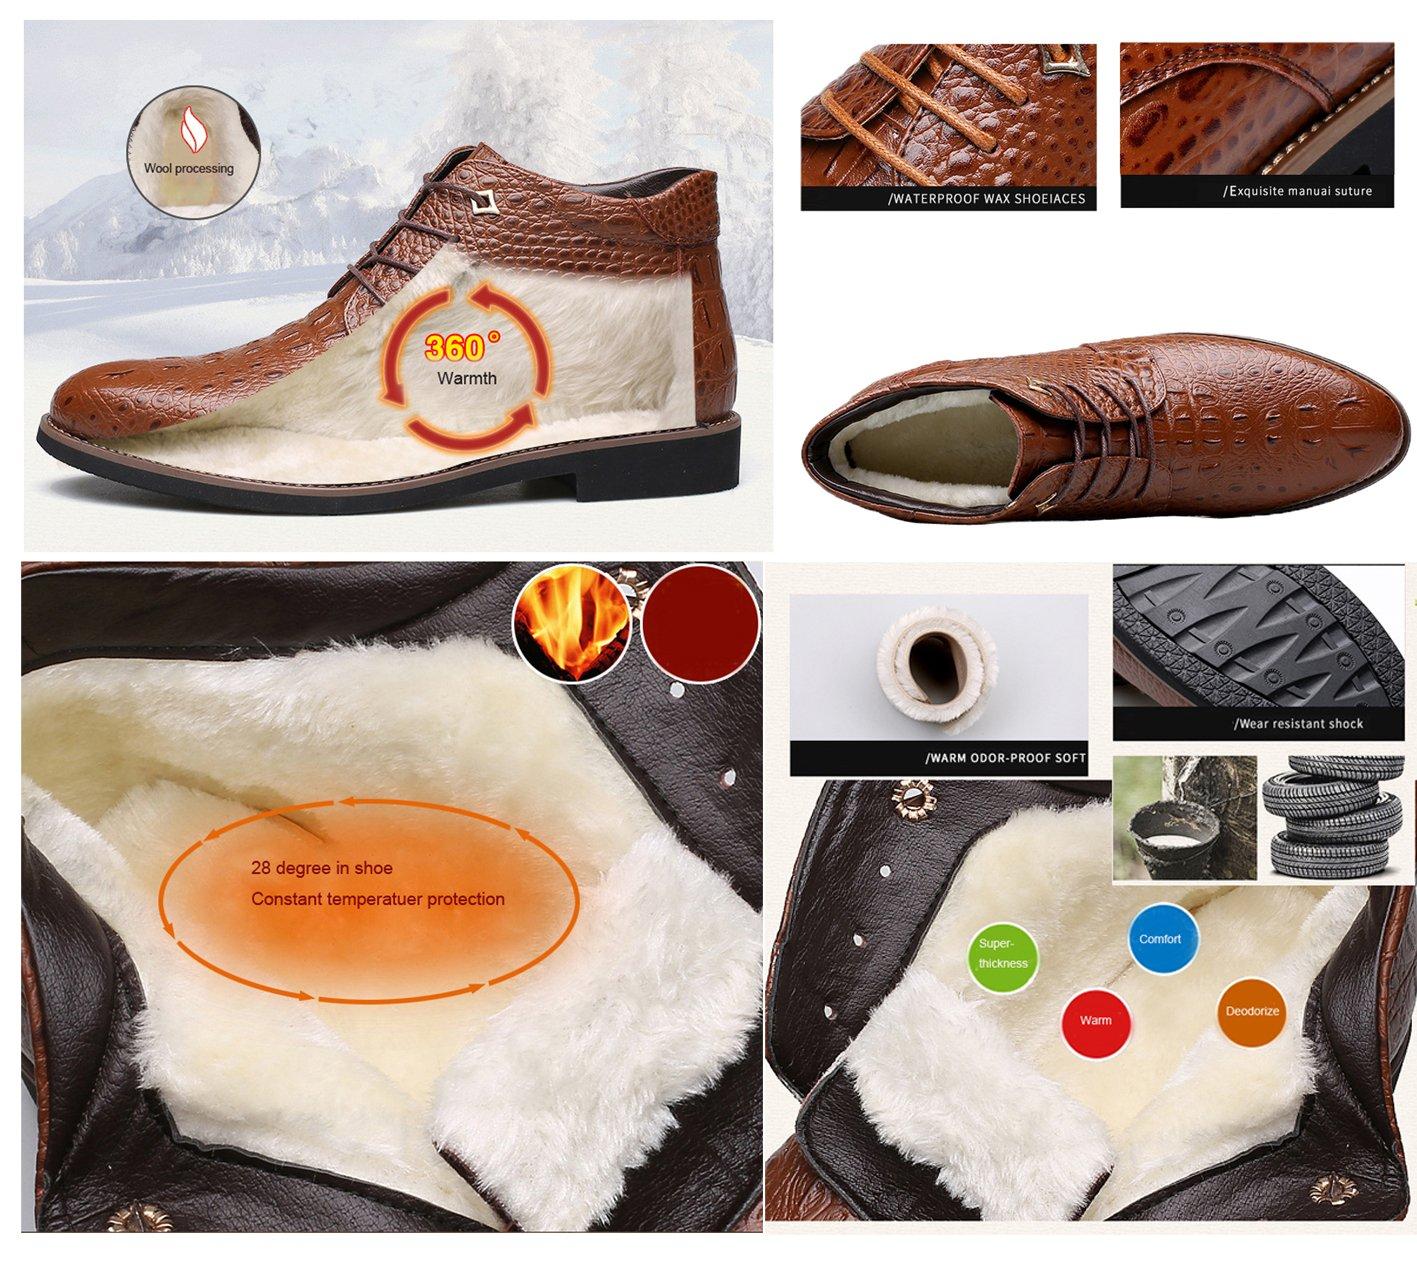 Gaorui Men Winter Warm Fur Lined Leather Snow Boot Alligator Business Dress Formal Shoe by Gaorui (Image #3)